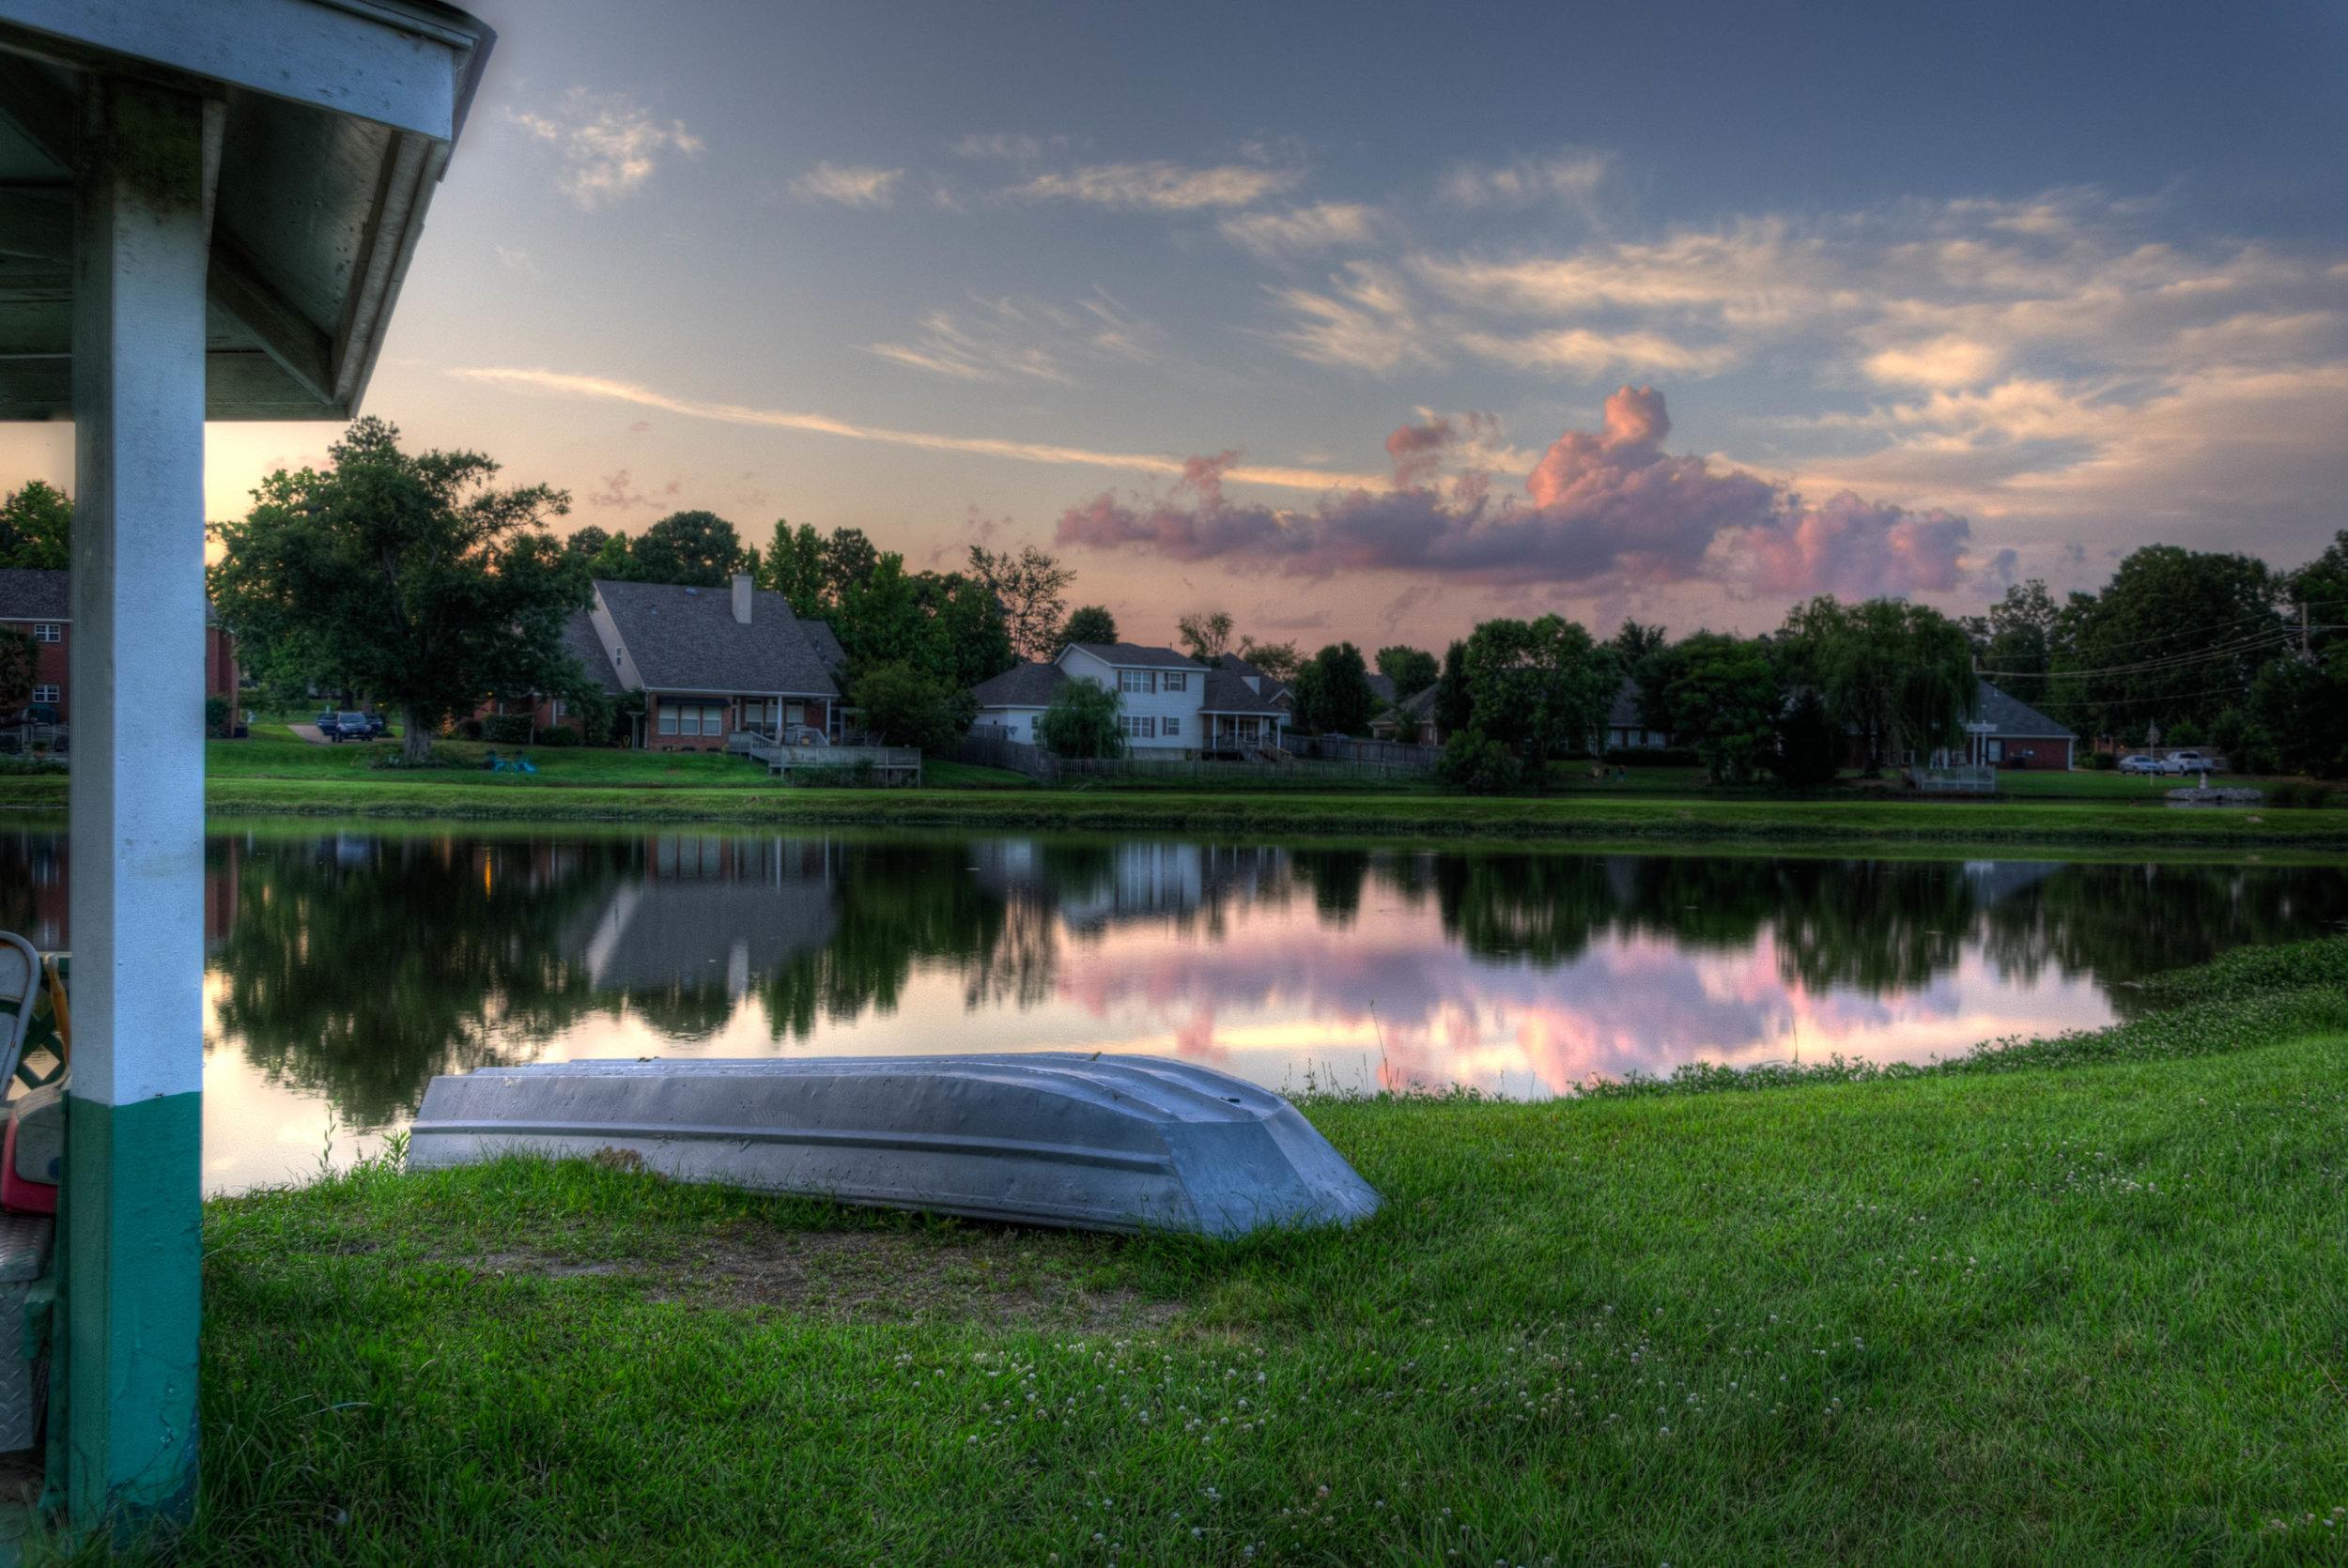 lakefront-real-estate-michigan.jpg